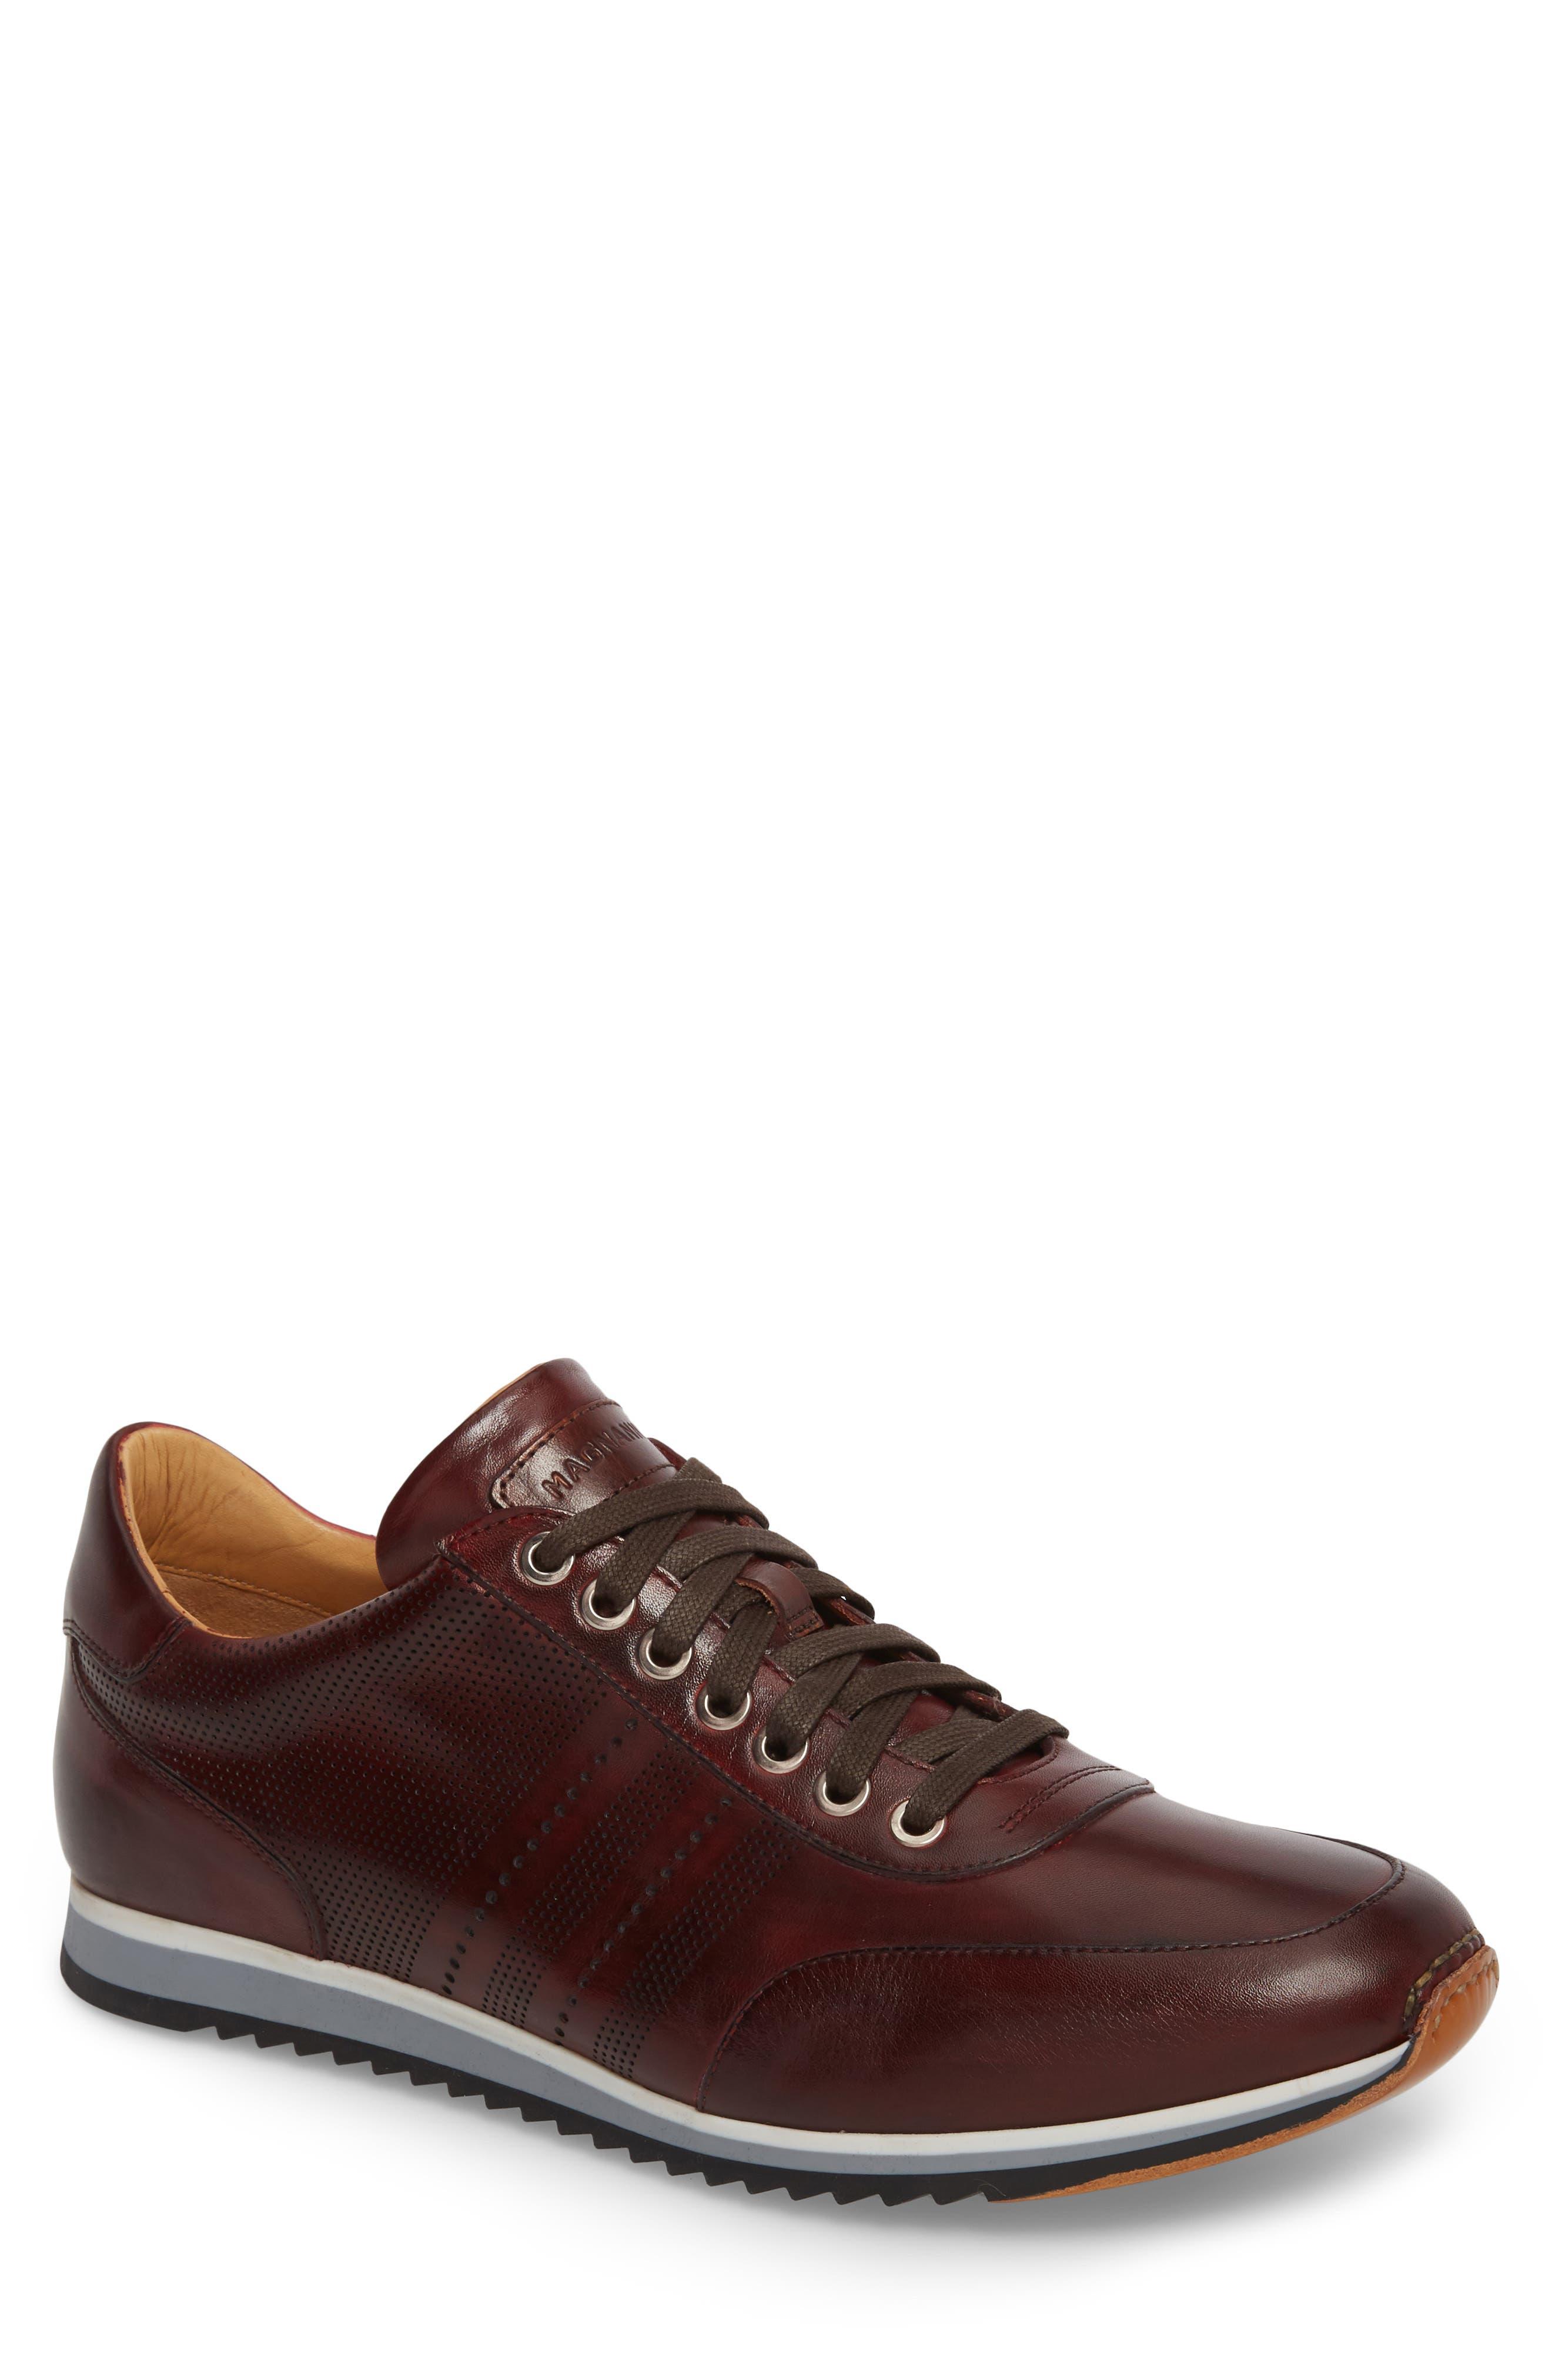 Main Image - Magnanni Merino Sneaker (Men)